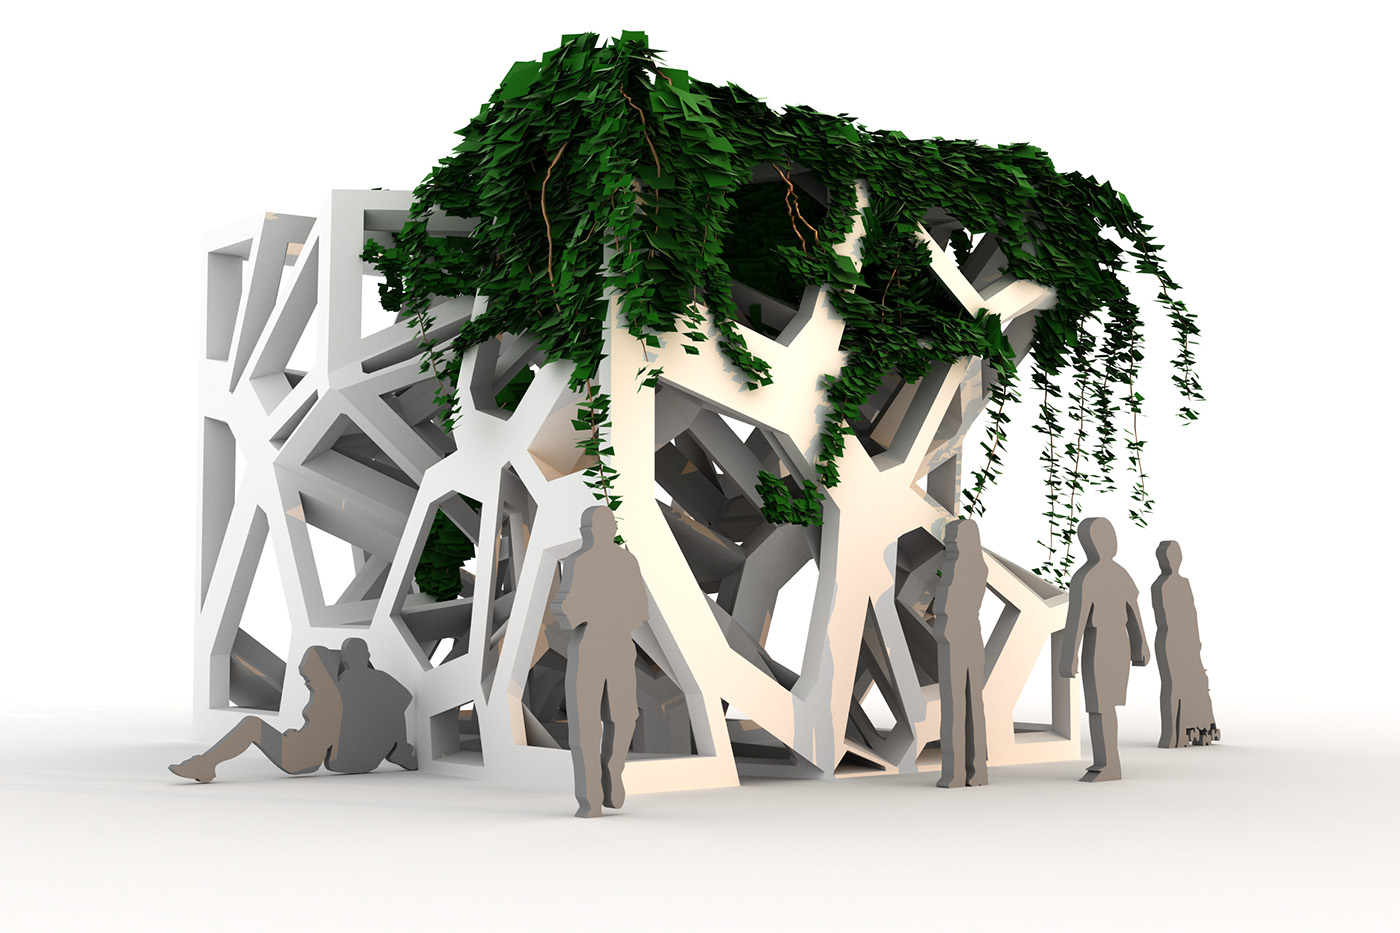 three dimensional urban green volume - HD1400×933